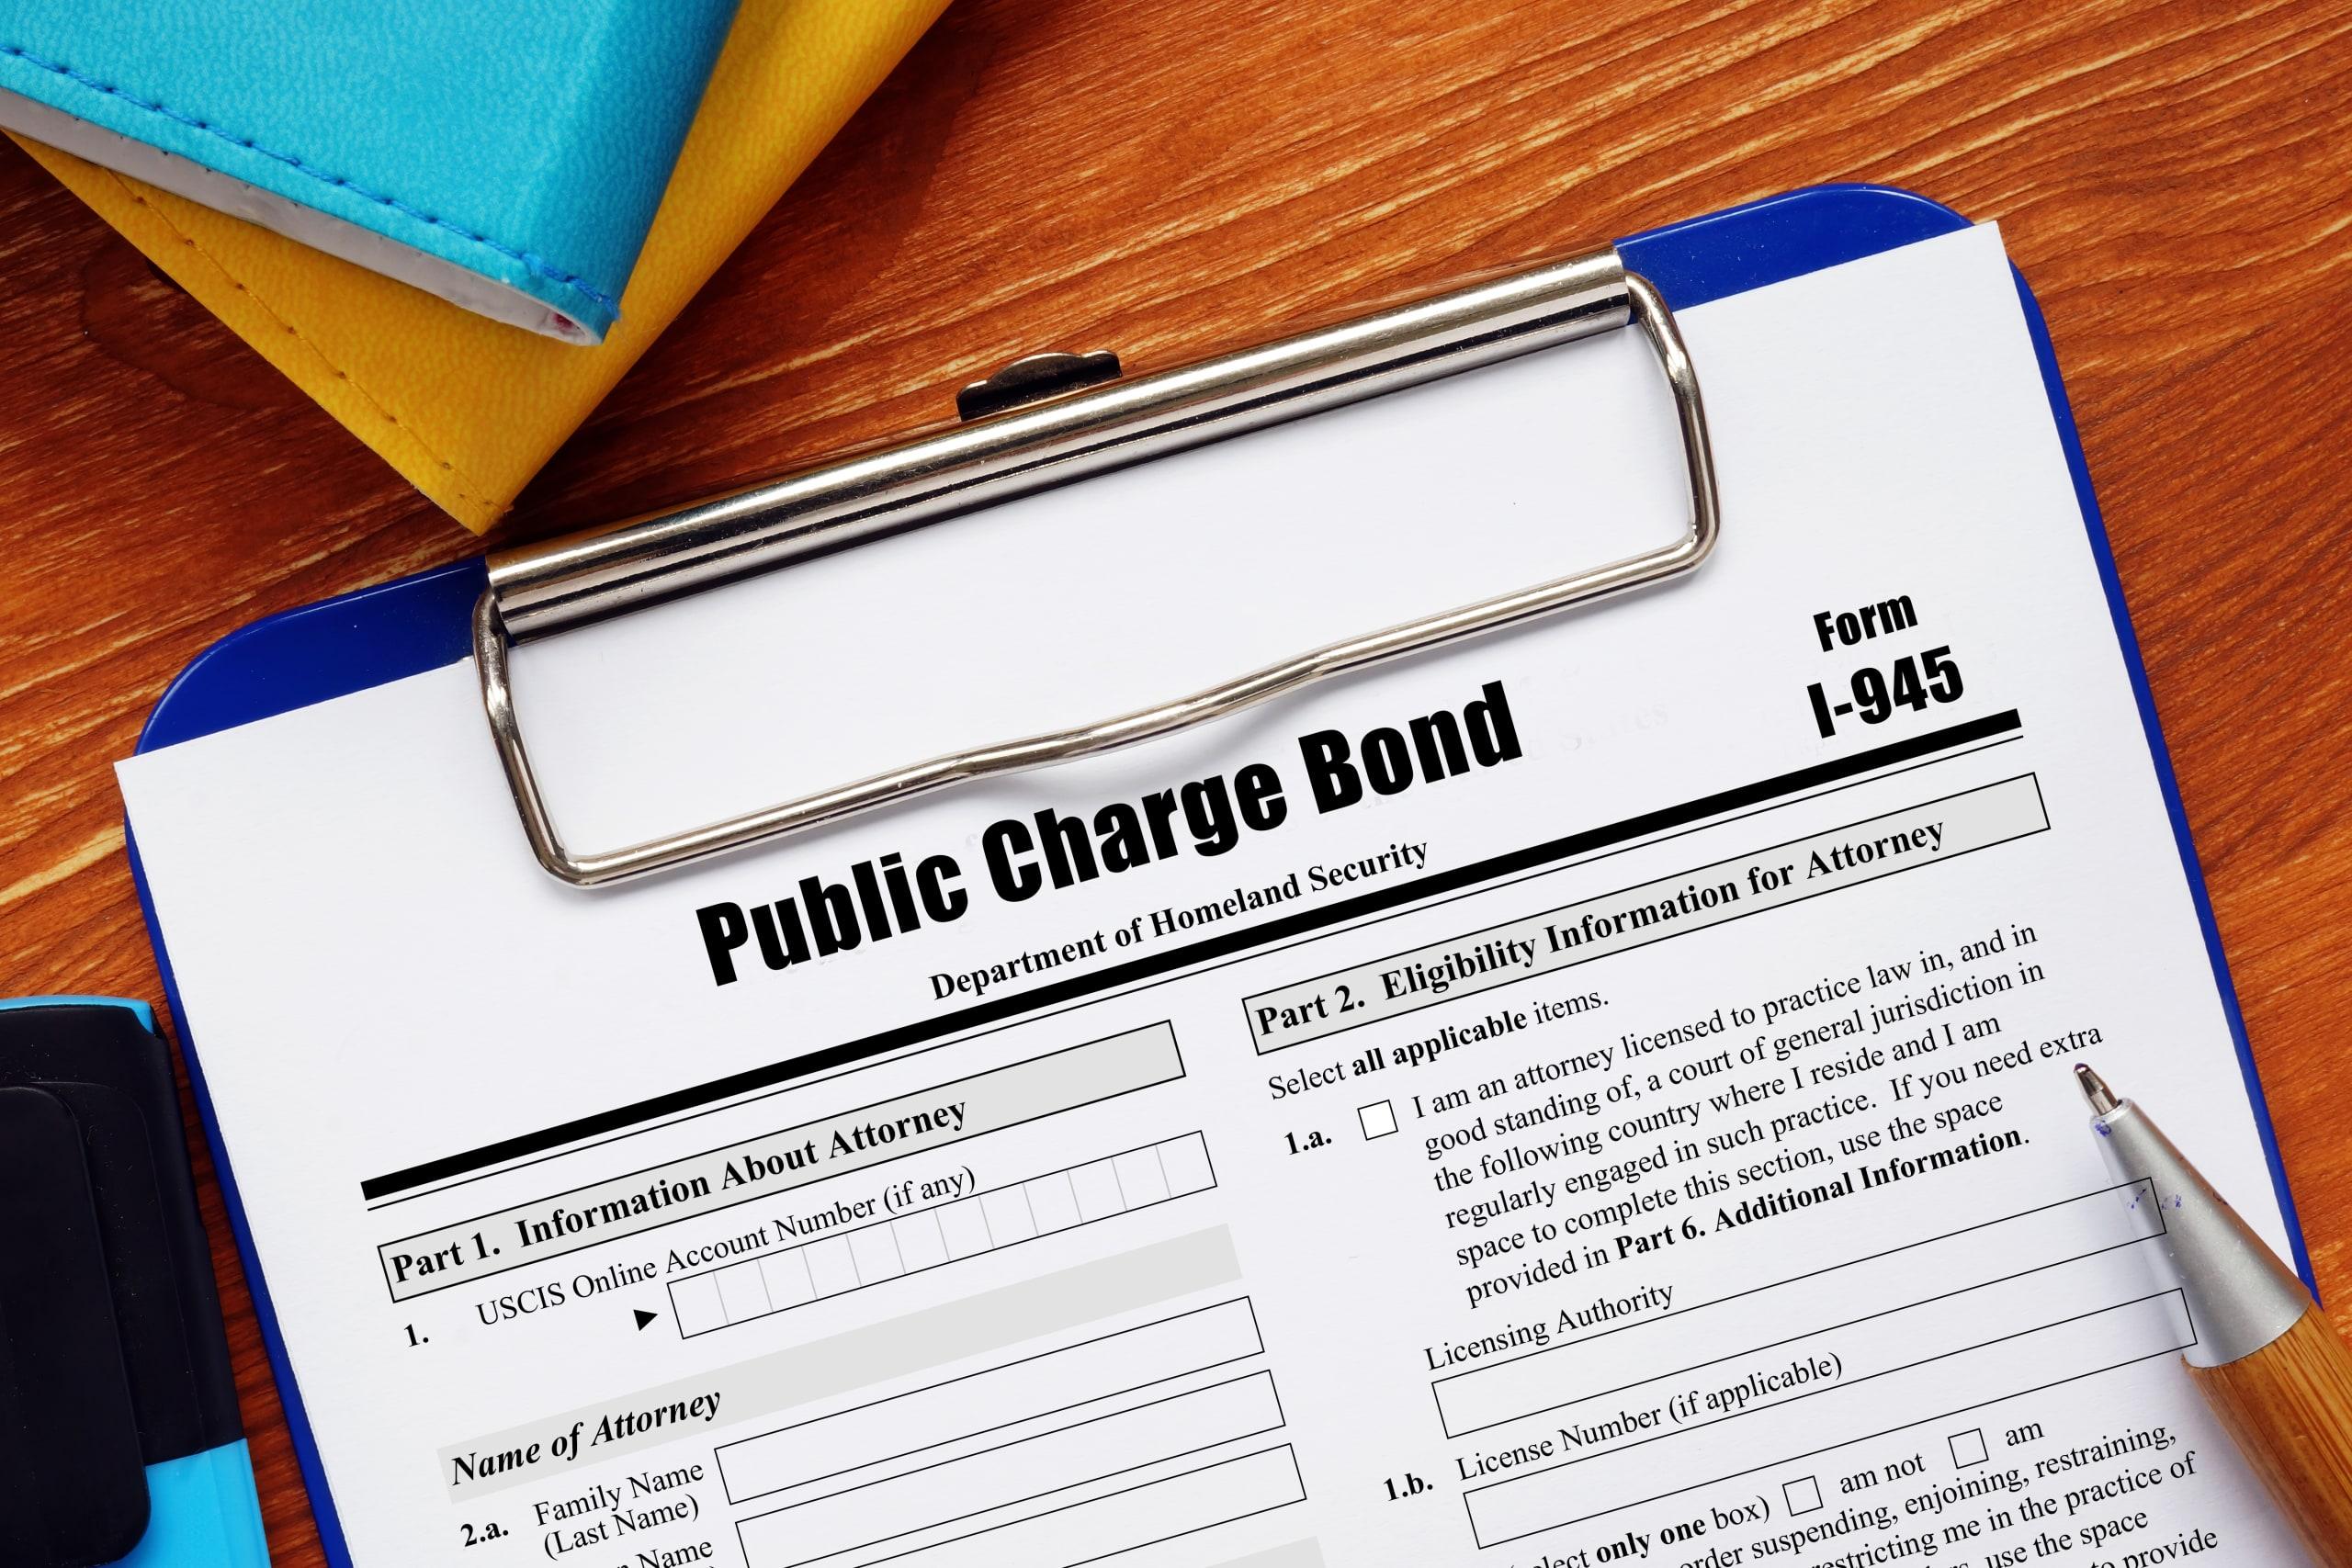 Arizona regla carga pública